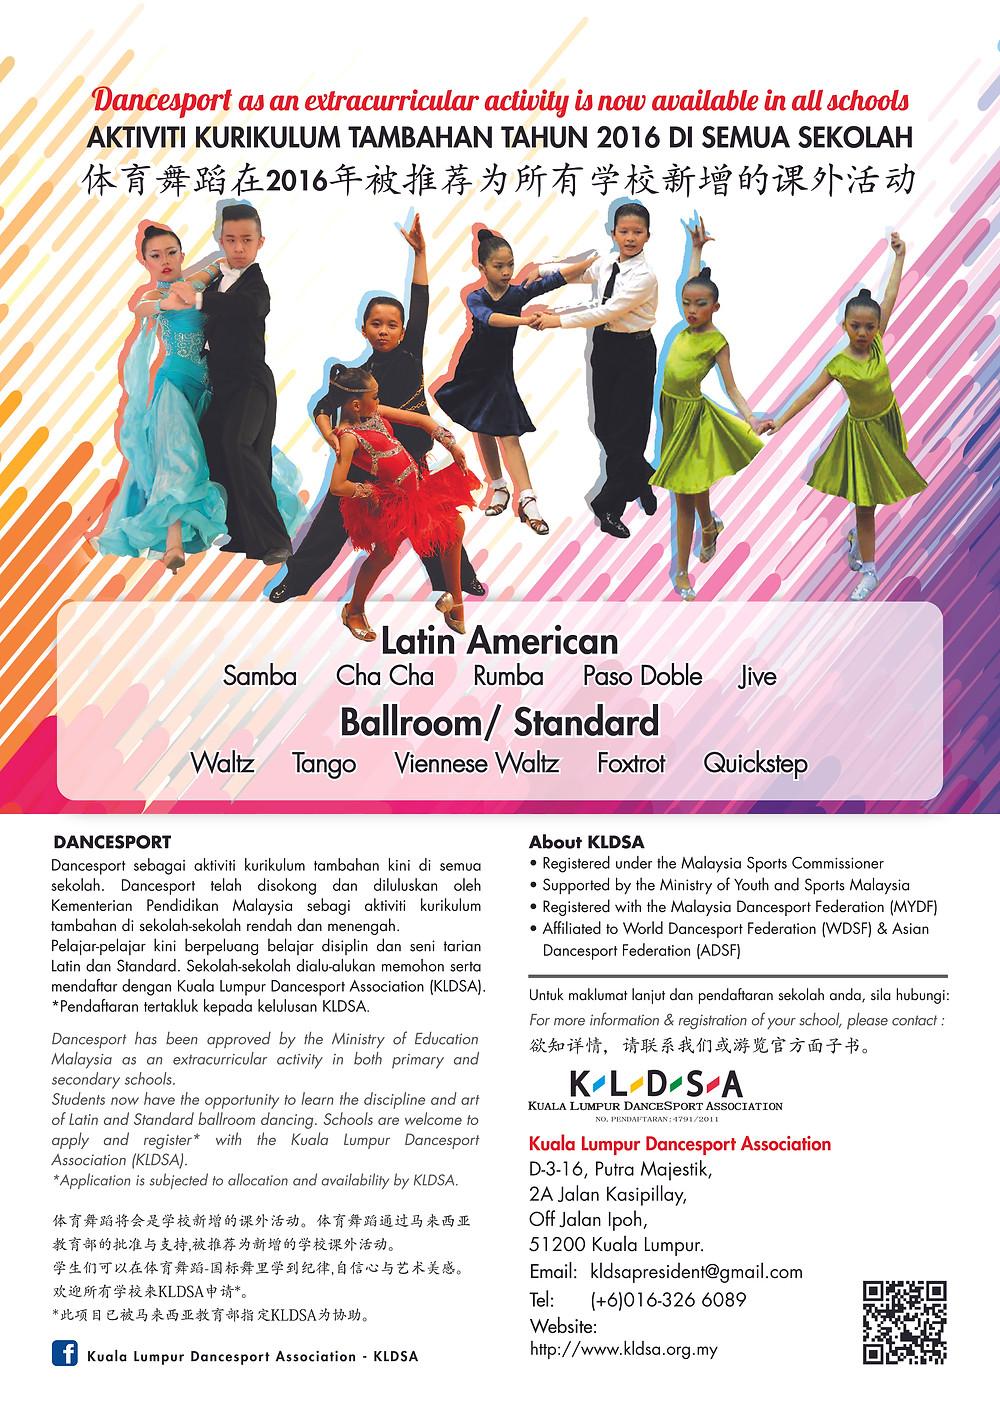 KLDSA School DanceSport Program Poster